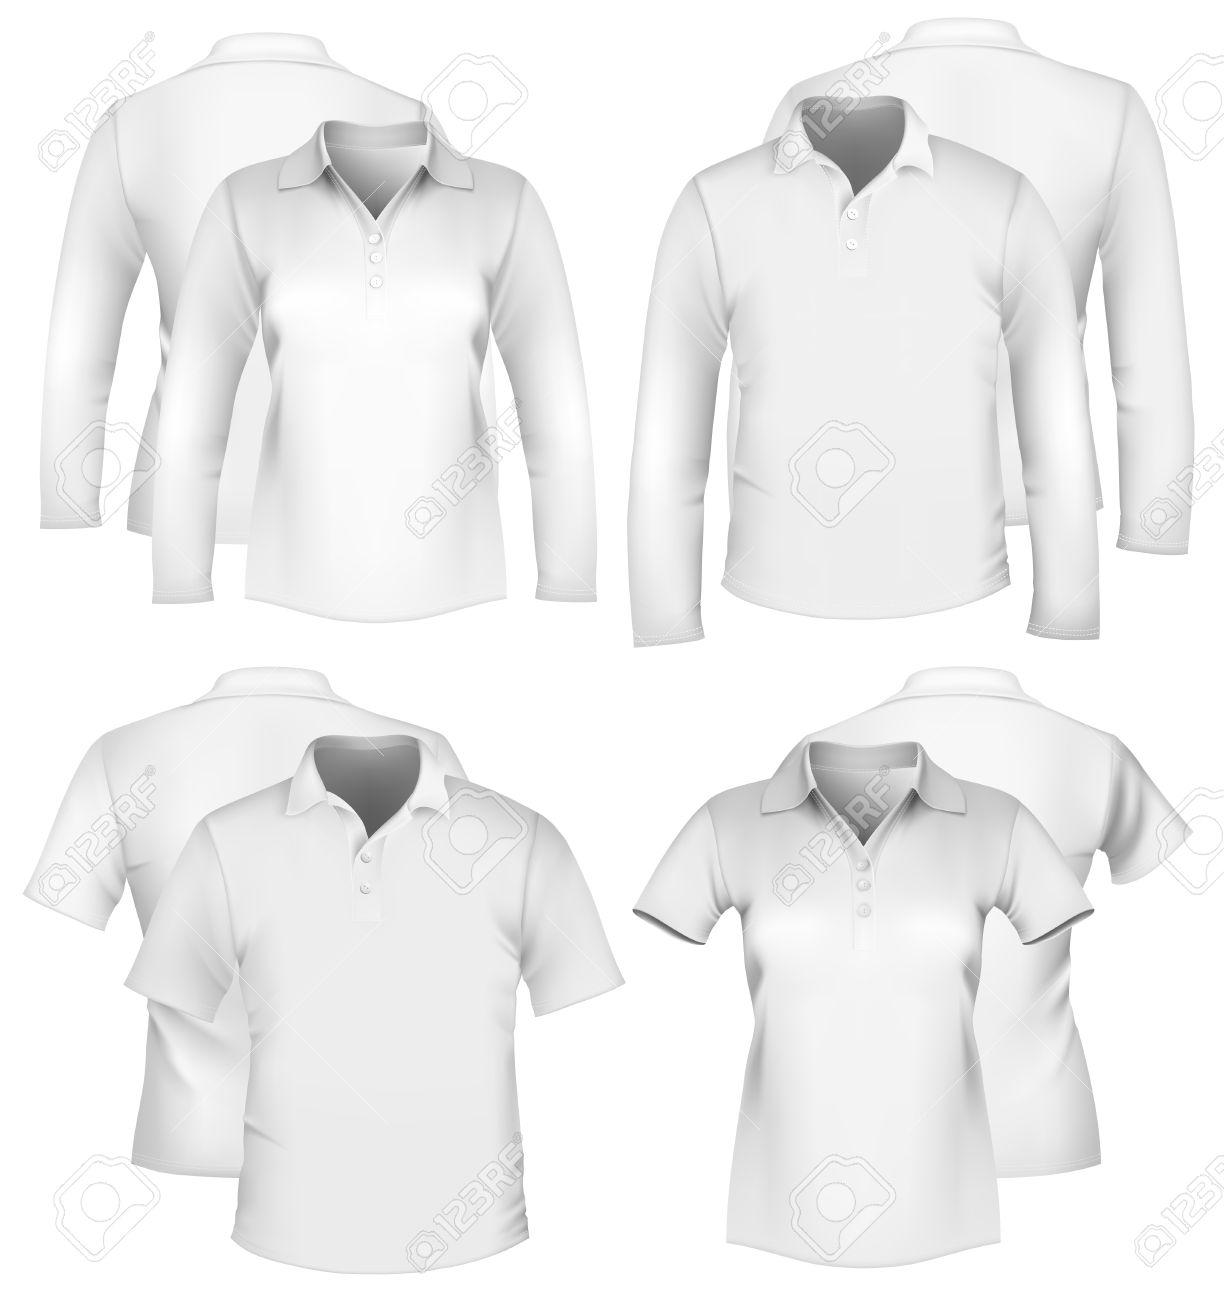 Shirt design vector pack - Vector Men S And Women S Shirt Design Templates Stock Vector 10053375